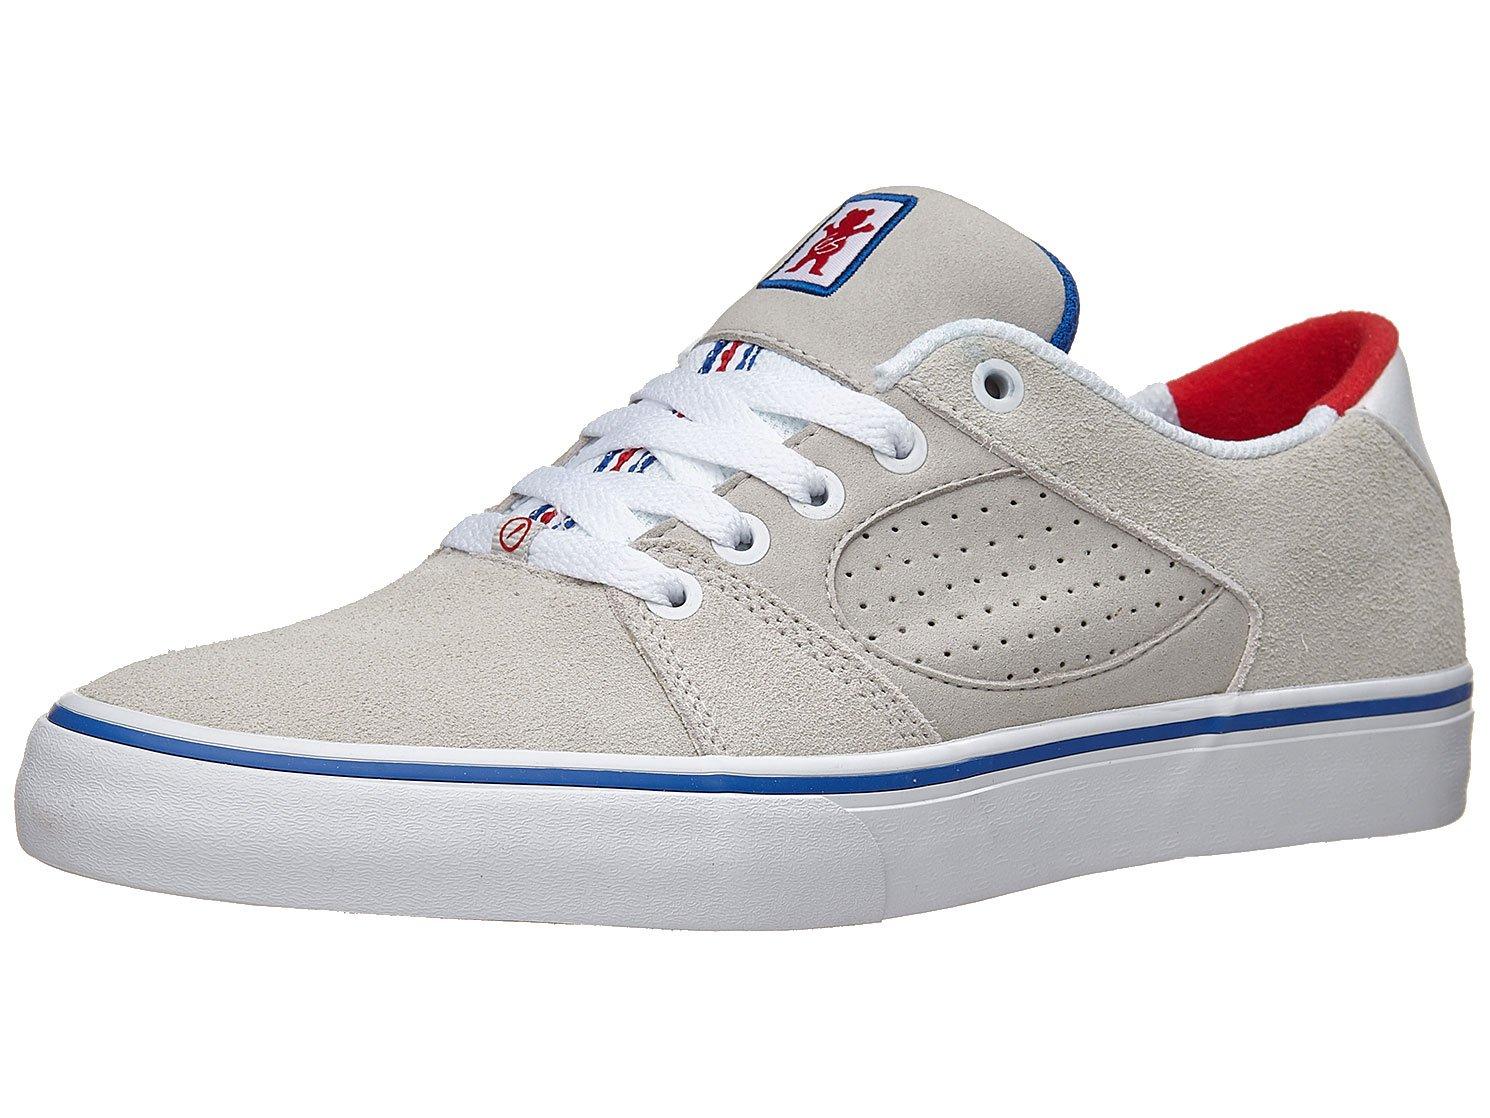 ES Square Three Three Three X Grizzly bianca scarpe Dimensione US 8,5 ad9e21